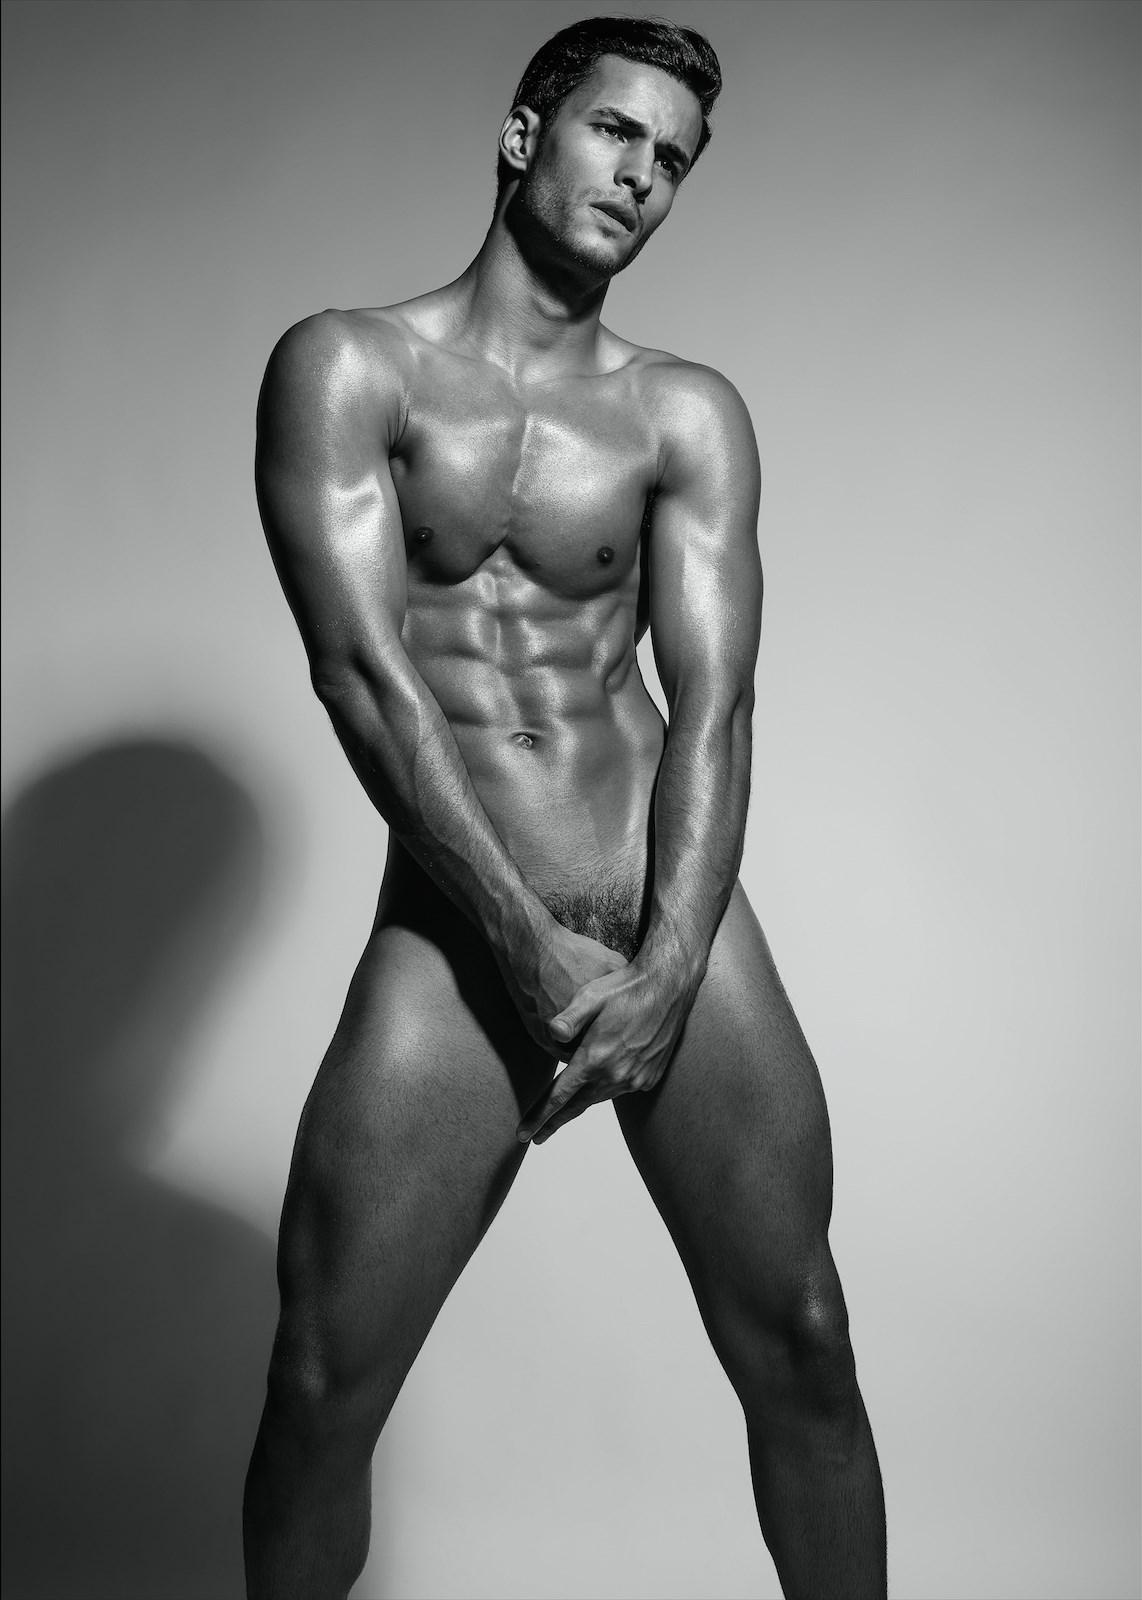 Calvin model naked photos, naked girls water guns